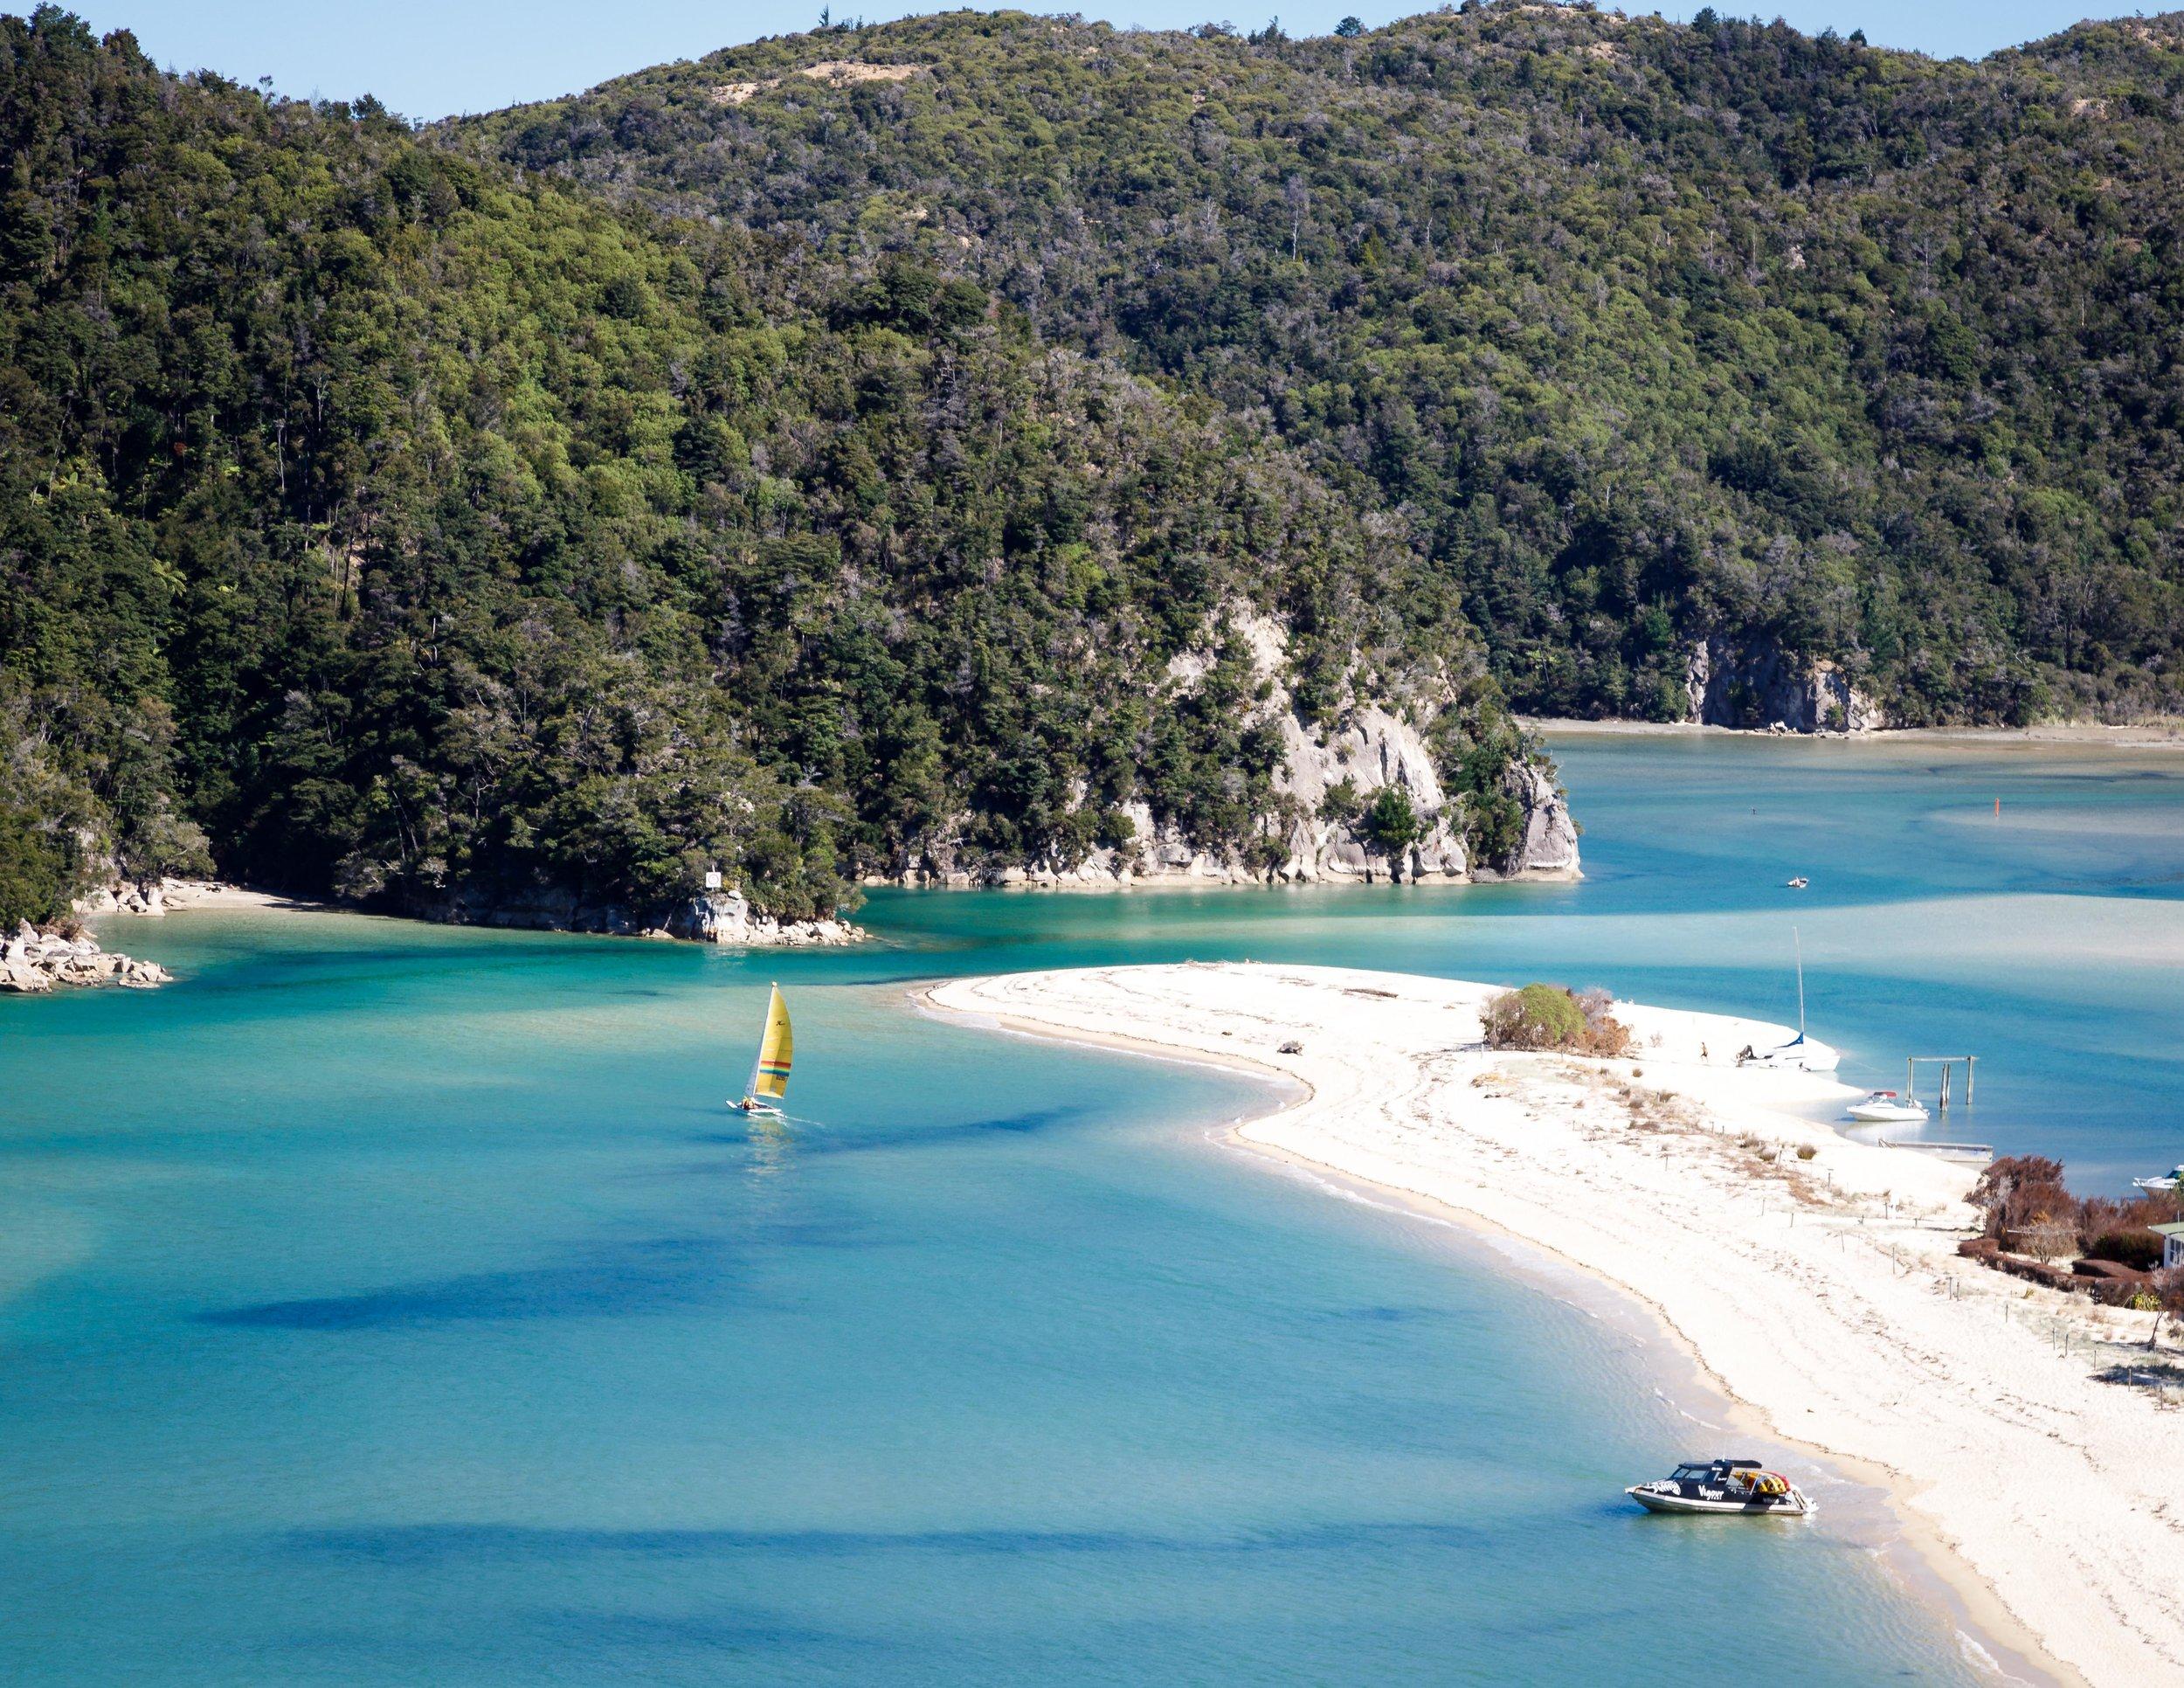 The beautiful Torrent Bay